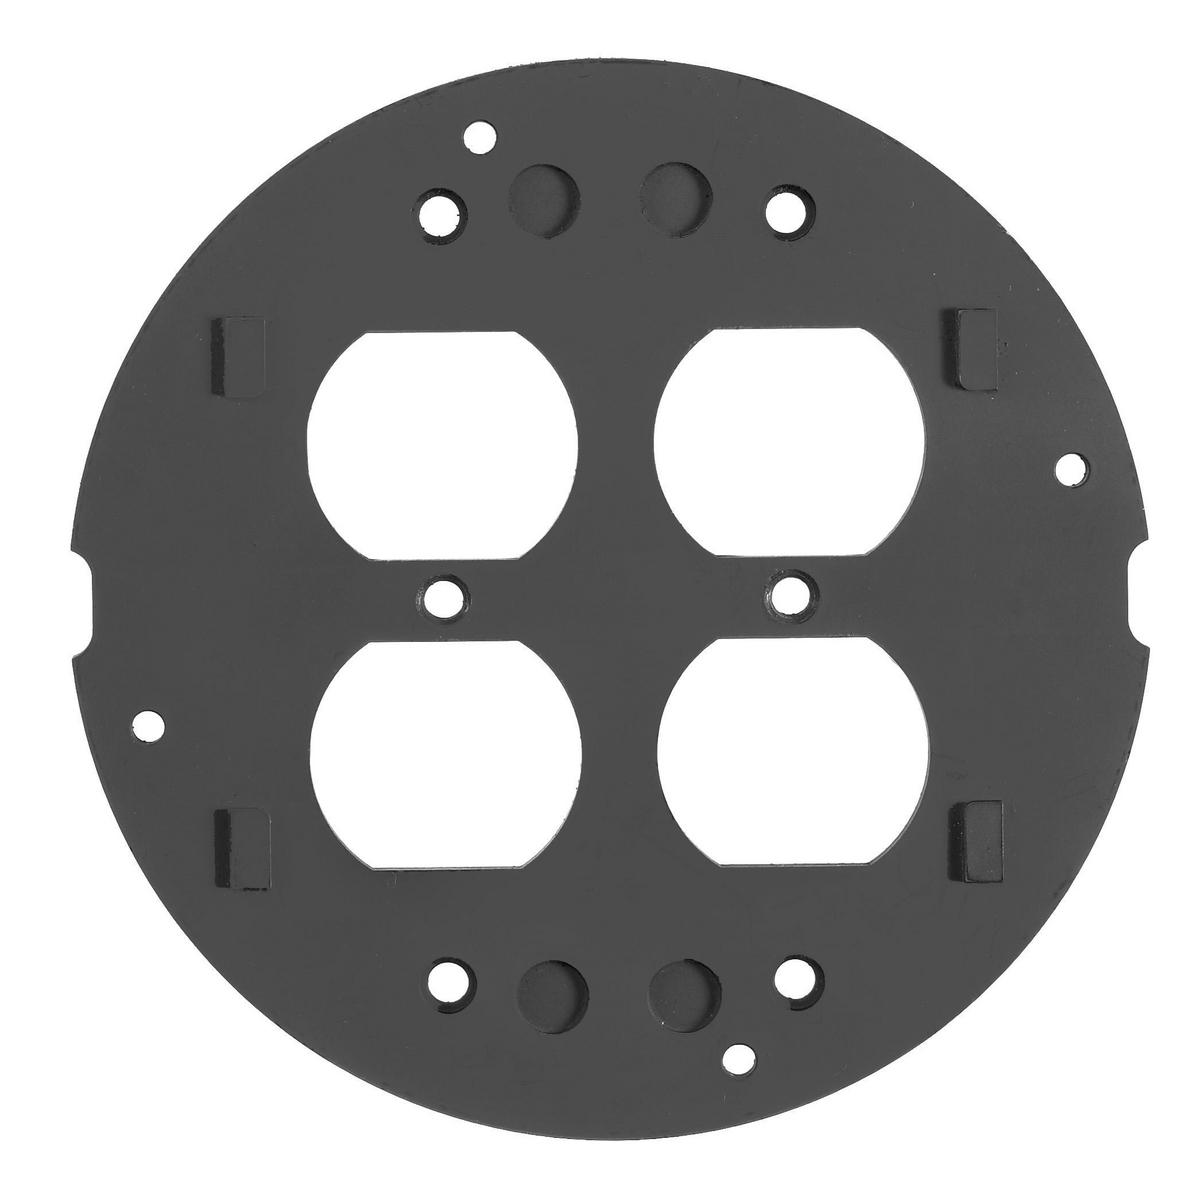 HUB S1SPDU SYSTEMONE SUBPLATE DOUBLE DUPLEX